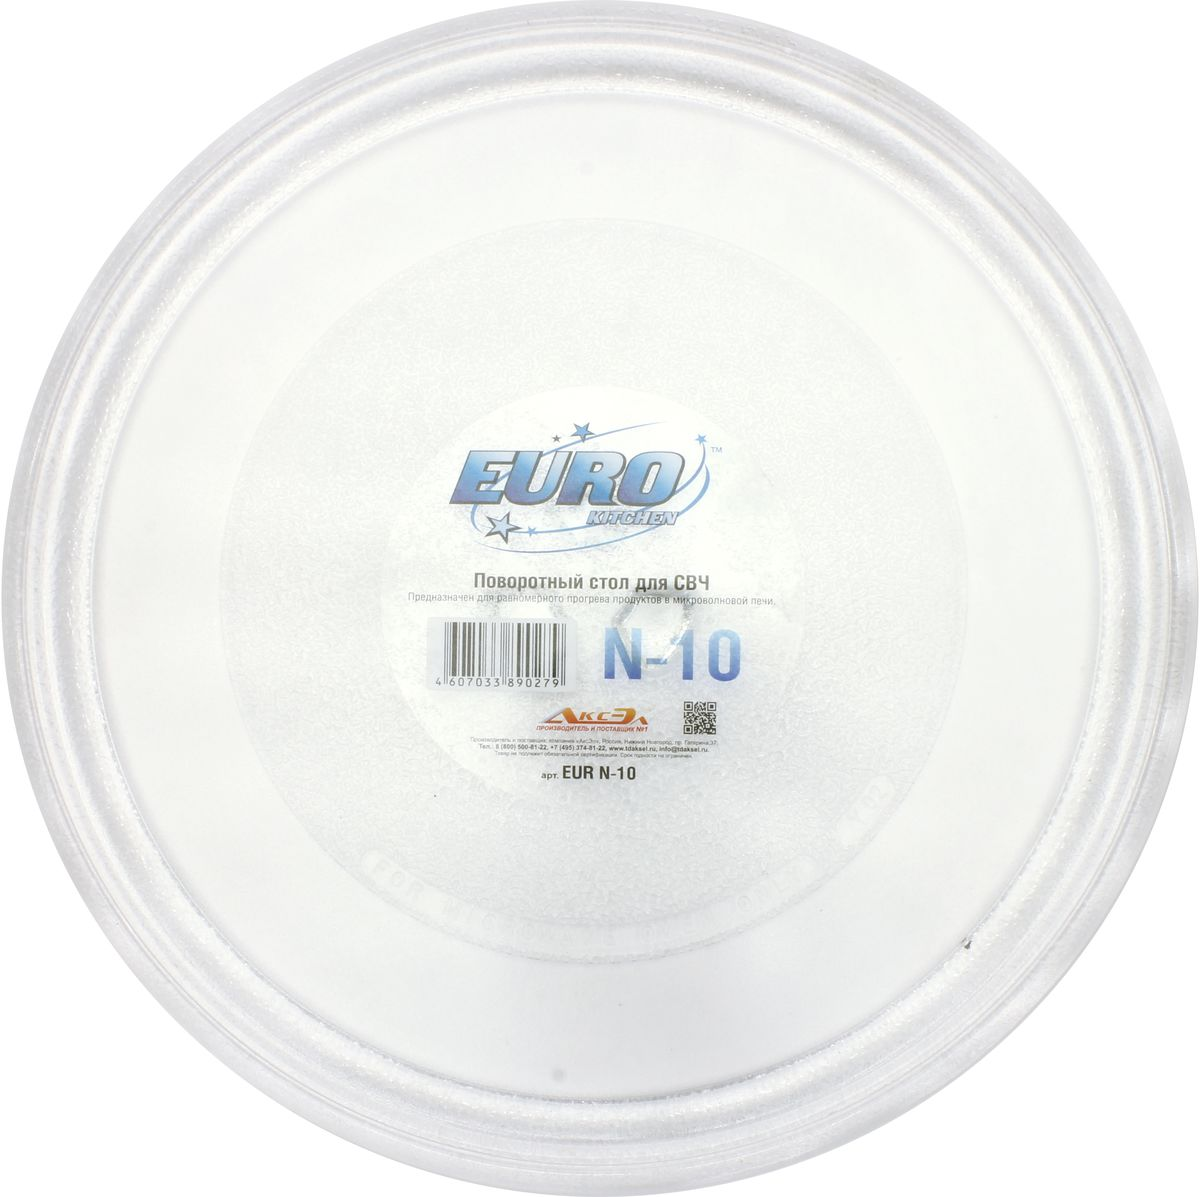 Euro Kitchen N-10 тарелка для СВЧN-10Универсальная тарелка N-10 для микроволновой печи с куплером. Диаметр тарелки 284 мм. Изготовлена из специального жаропрочного стекла. Предназначена для равномерного разогрева продуктов в микроволновой печи.Подходит для брендов: Aeg, Airhot, Amica, Ardo, Ariston, Asko, Atlanta, Aurora, Ava, Barazza, Bauknecht, Bbk, Beko, Bomann, Bork, Bosch, Brandt, Candy, Cata, Centek, Clatronic,Daewoo, De dietrich, Delfa, Electrolux, Elenberg, Ergo, Erisson, Eurotec, Fagor, Fimar, Foster, Franke, Fulgor, Fusion, Gaggenau, Gastrorag, Goldstar, Gorenje, Hankel, Hansa, Hilton, Horizont, Hurakan, Hyundai, Ilve, Indesit, Kaiser, Kenmore, Kenwood, Korting, Kuppersberg, Kuppersbusch, Kamark, Keran, Lg, Liberton, Liberty, Maxwell, Menumaster, Midea, Miele, Moulinex, Mystery, Neff, Oursson, Panasonic, Proficook, Rainford, Redmond, Rolsen, Samsung, Saturn, Scarlett, Sencor, Sharp, Siemens, Simfer, Sinbo, Sirman, Smeg, Supra, Teka, Thomson, Toshiba, V-zug, Vasko, Vimar, Vitek, Vr, Weissgauff, West, Whirlpool, Zanussi, Zelmer, Zigmund&Shtain, Витязь, Рубин.